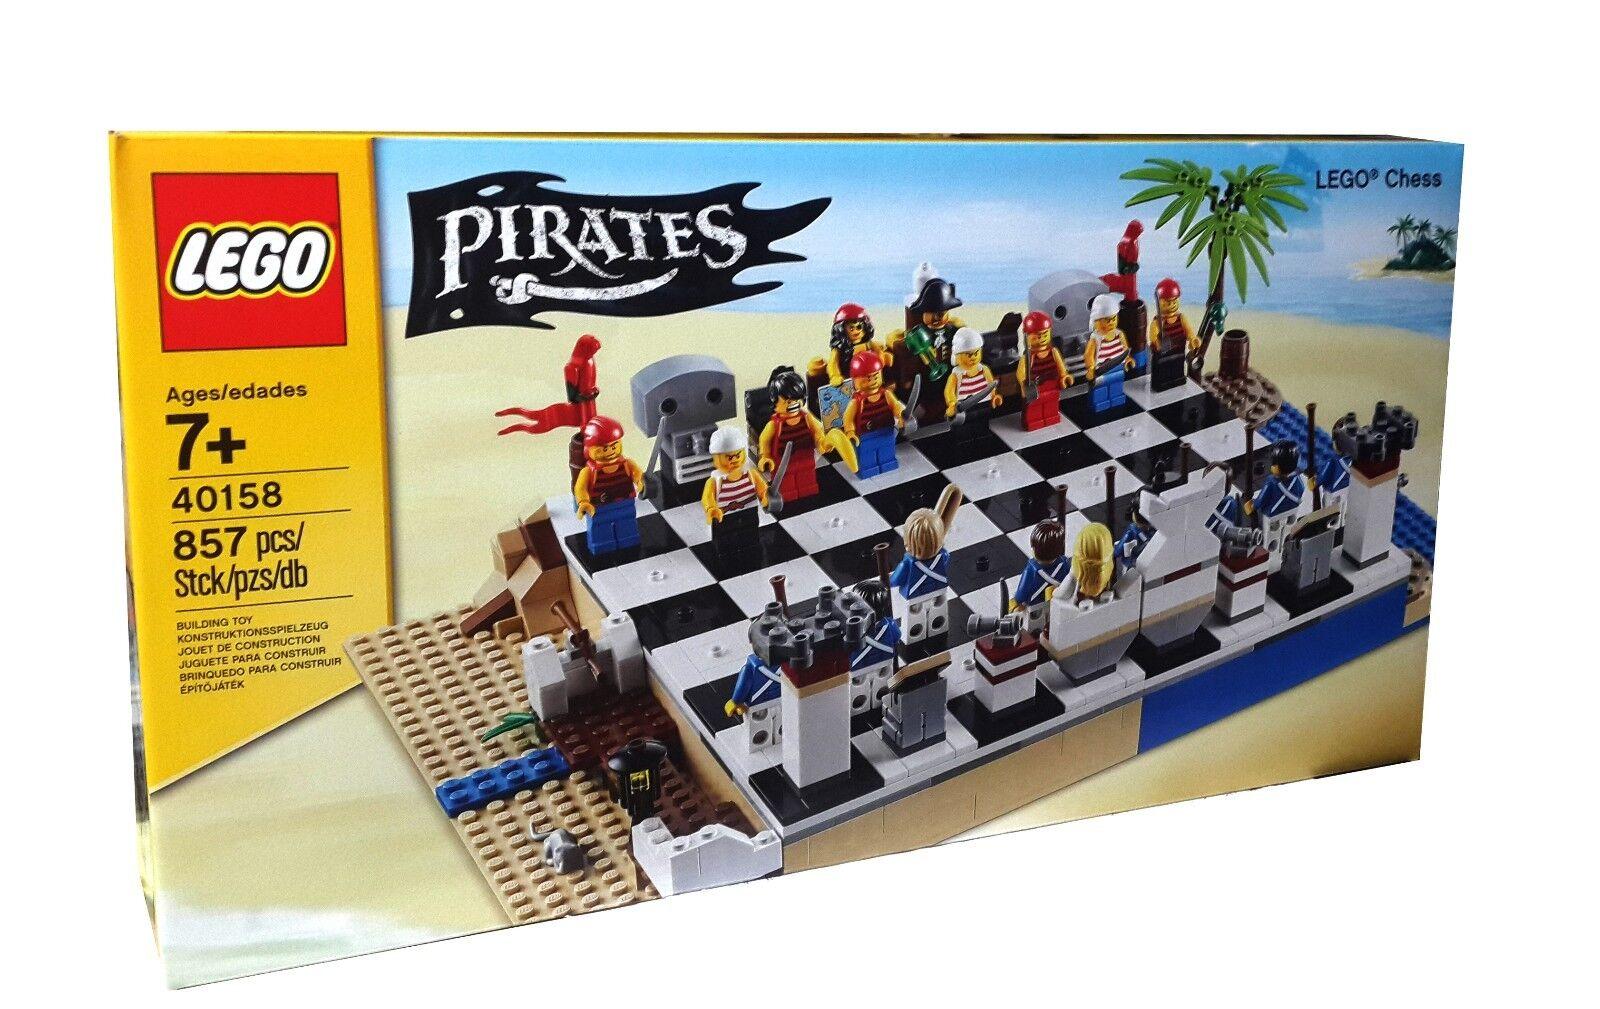 LEGO Pirate Series 40158 Lego Pirates Chess (New)